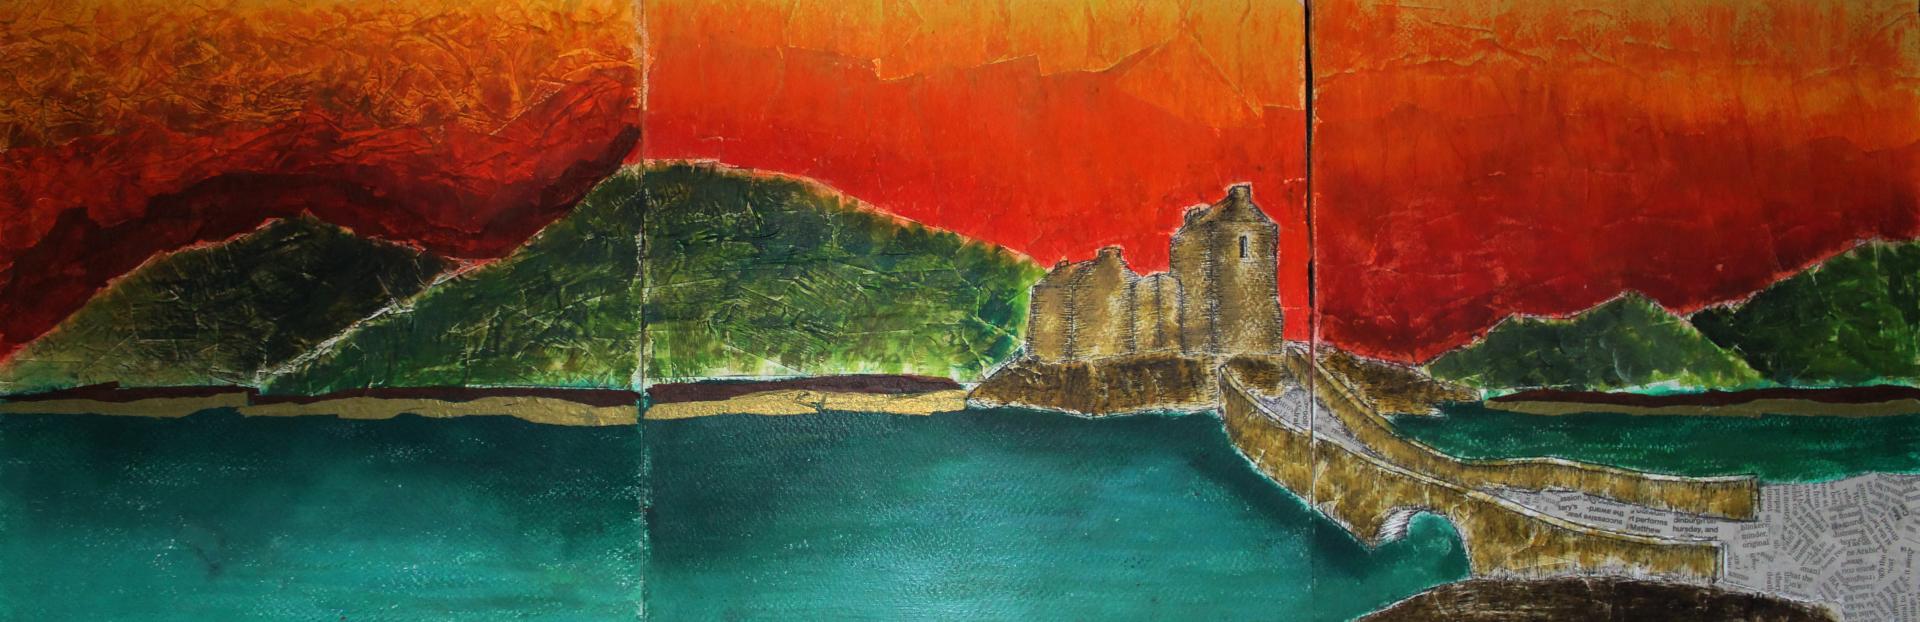 Abstract Eilean Donan Castle